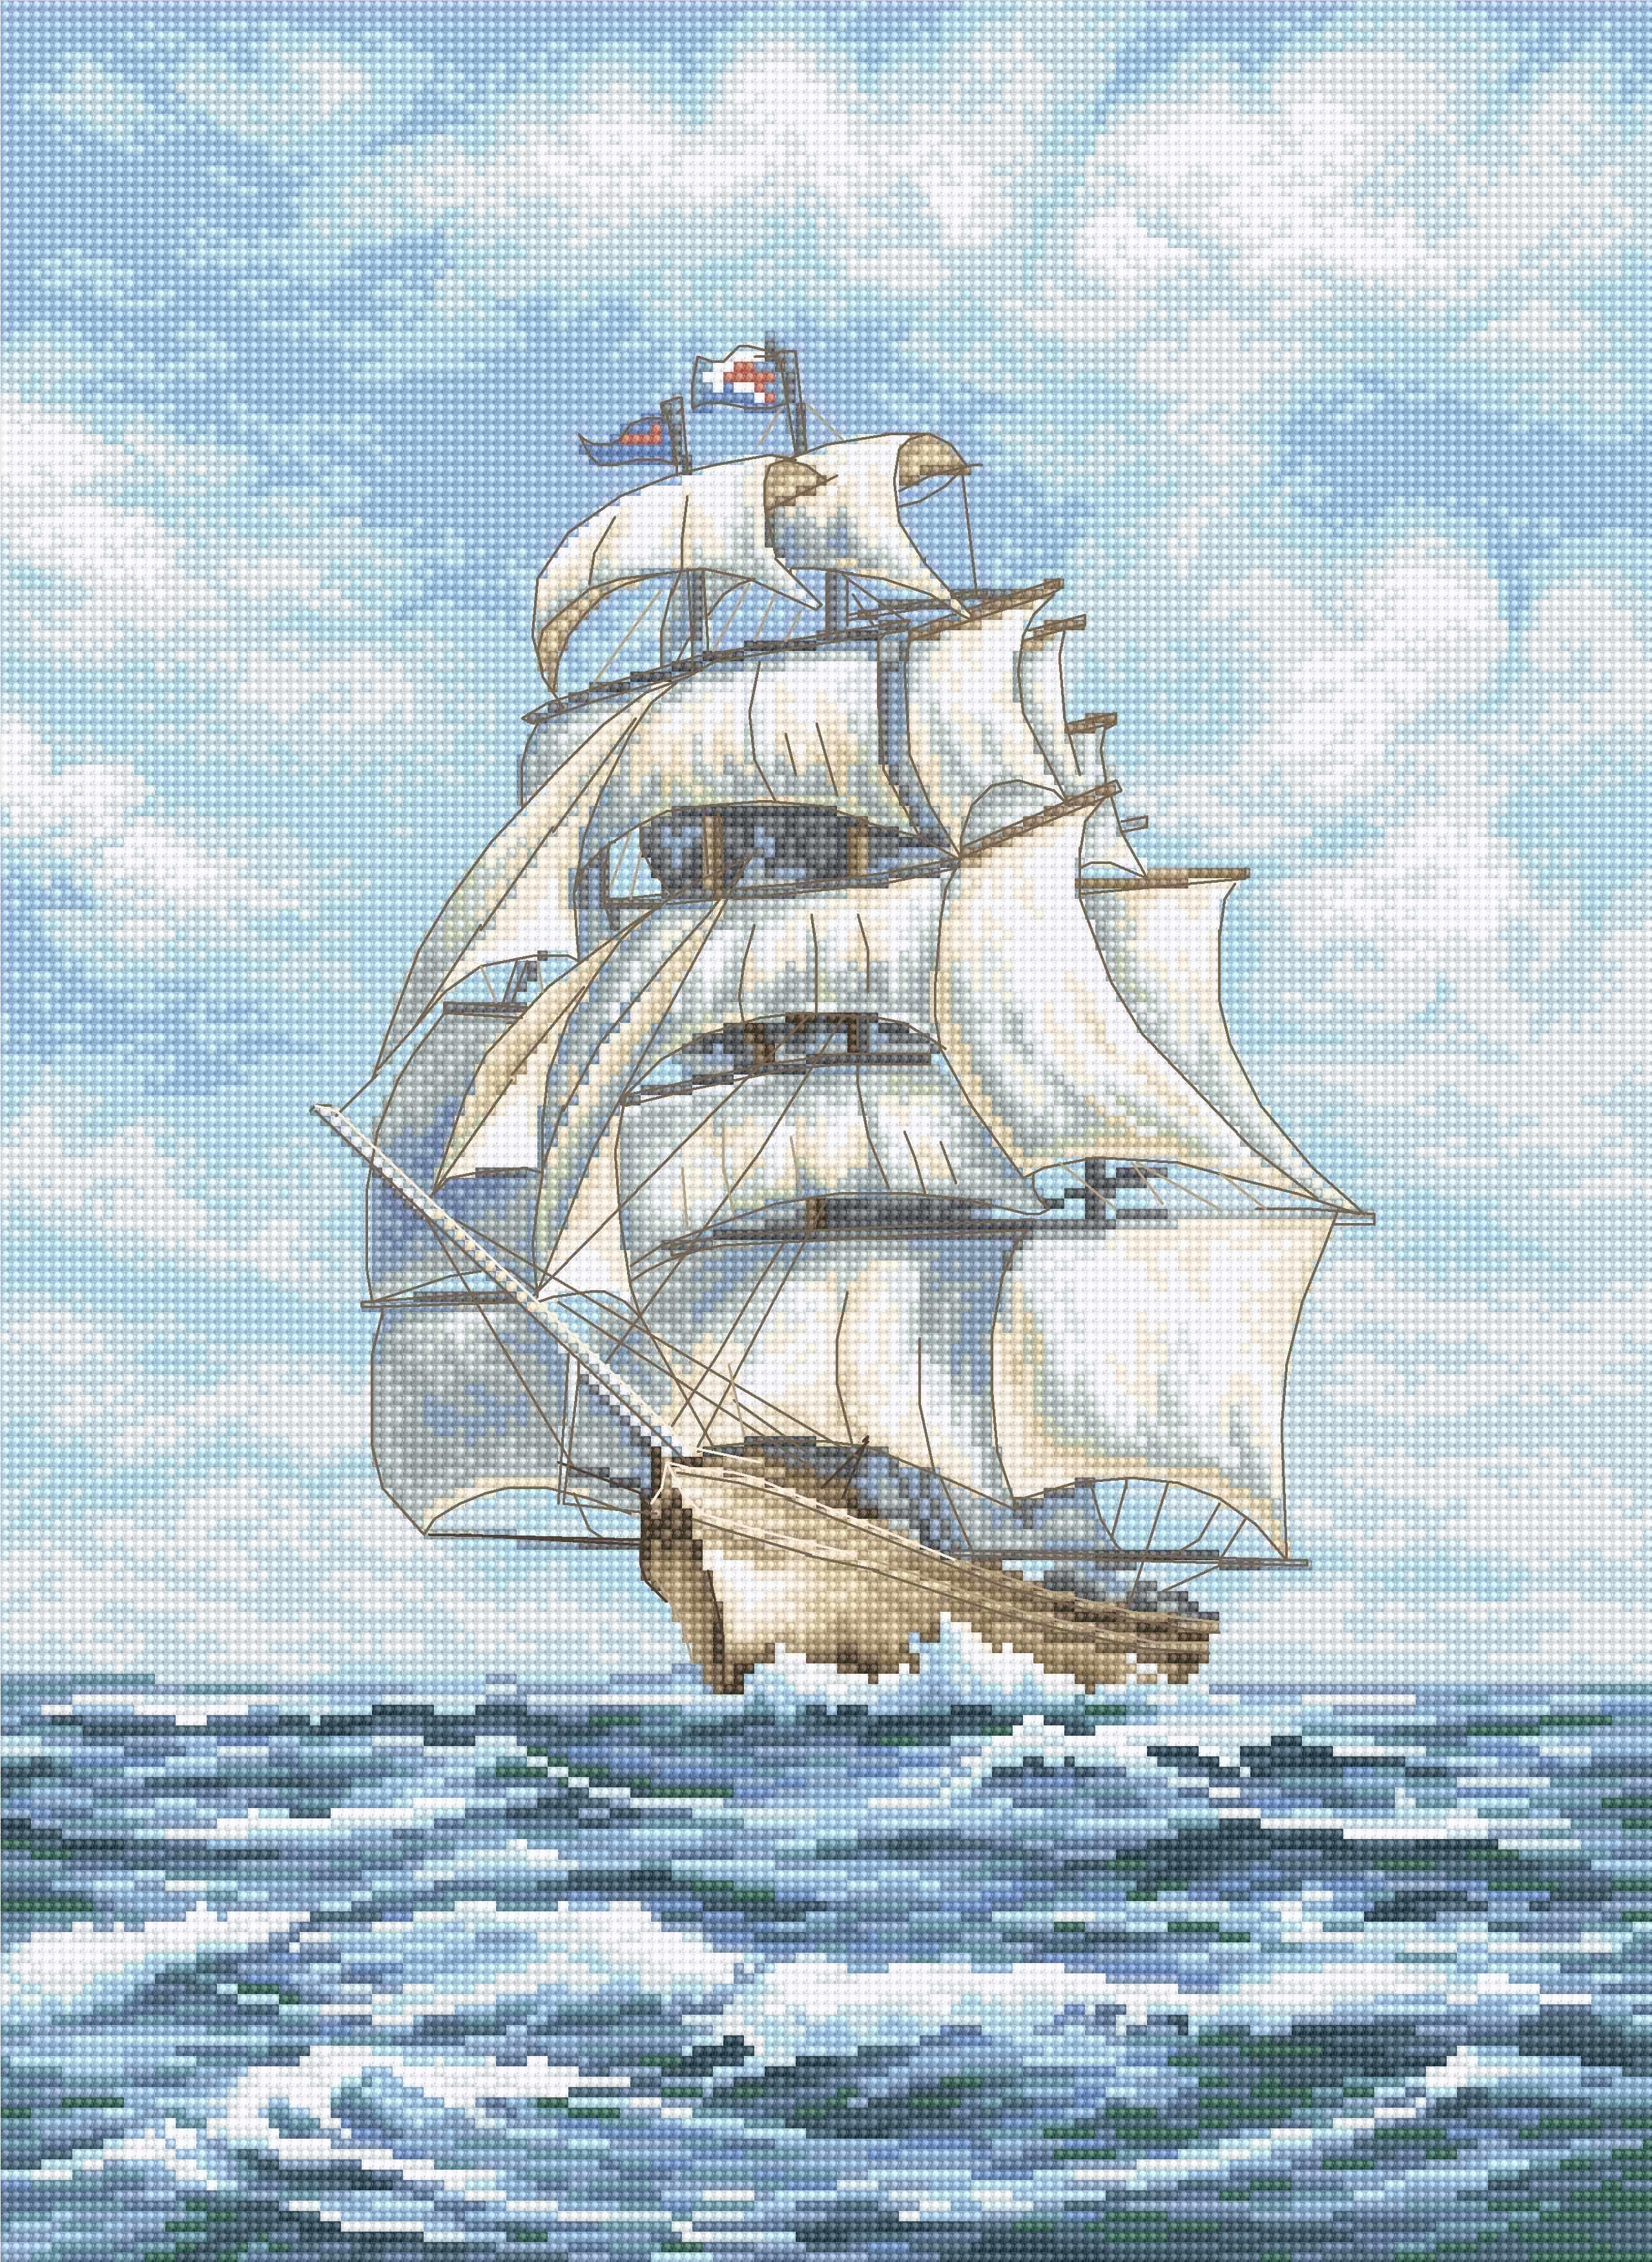 907 Ship  - Leti